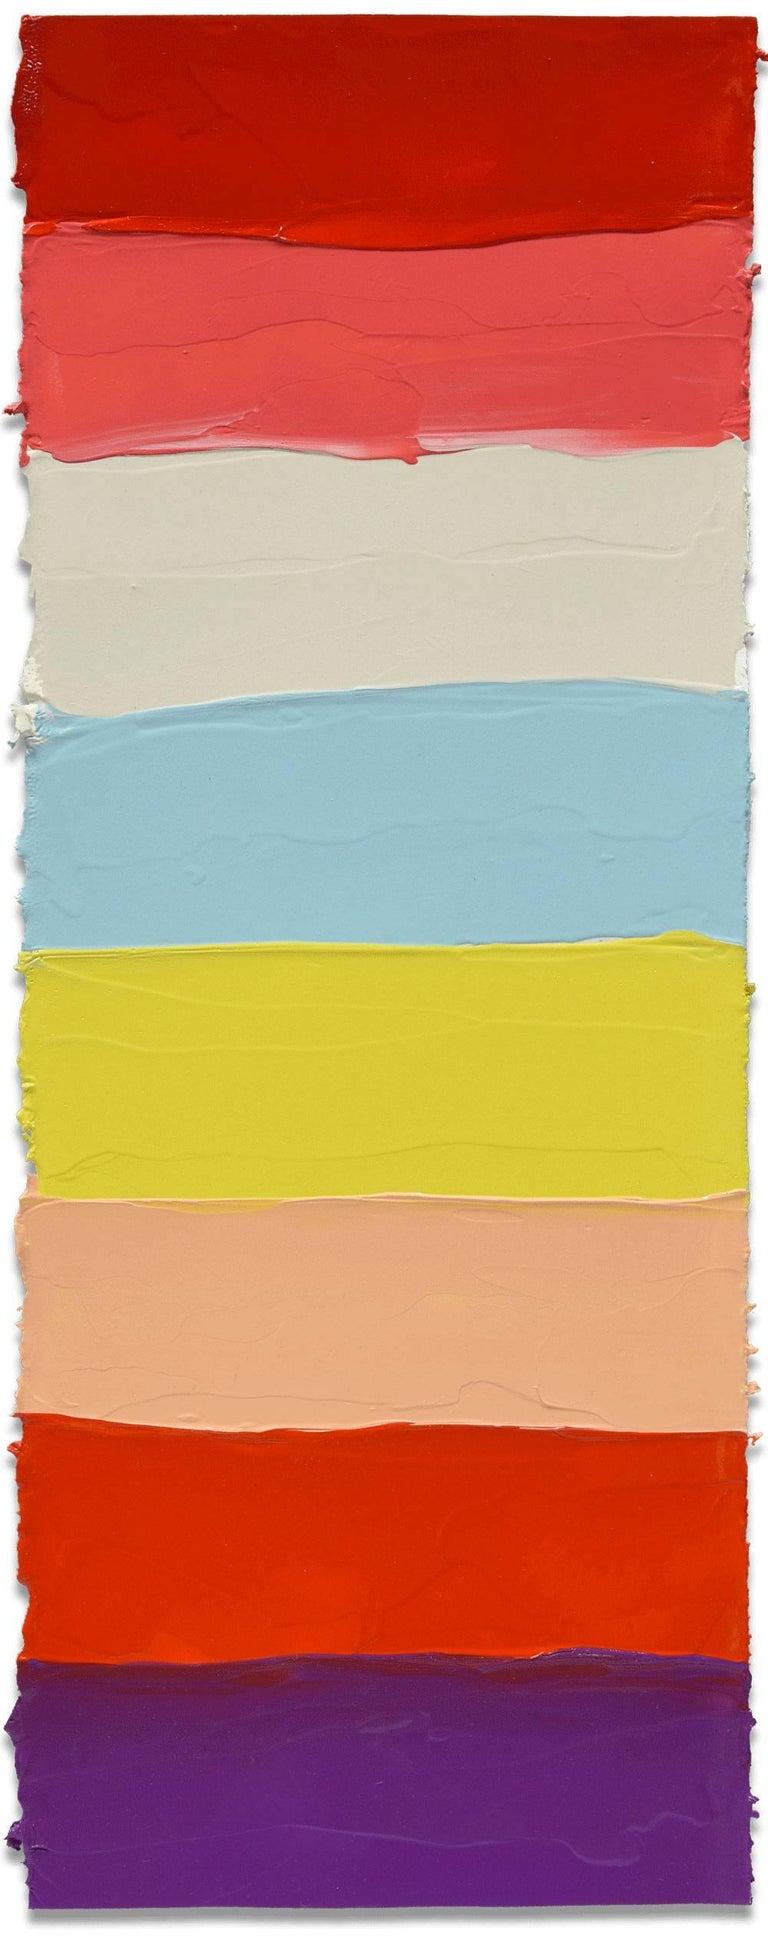 Anya Spielman Abstract Painting - Hashtag